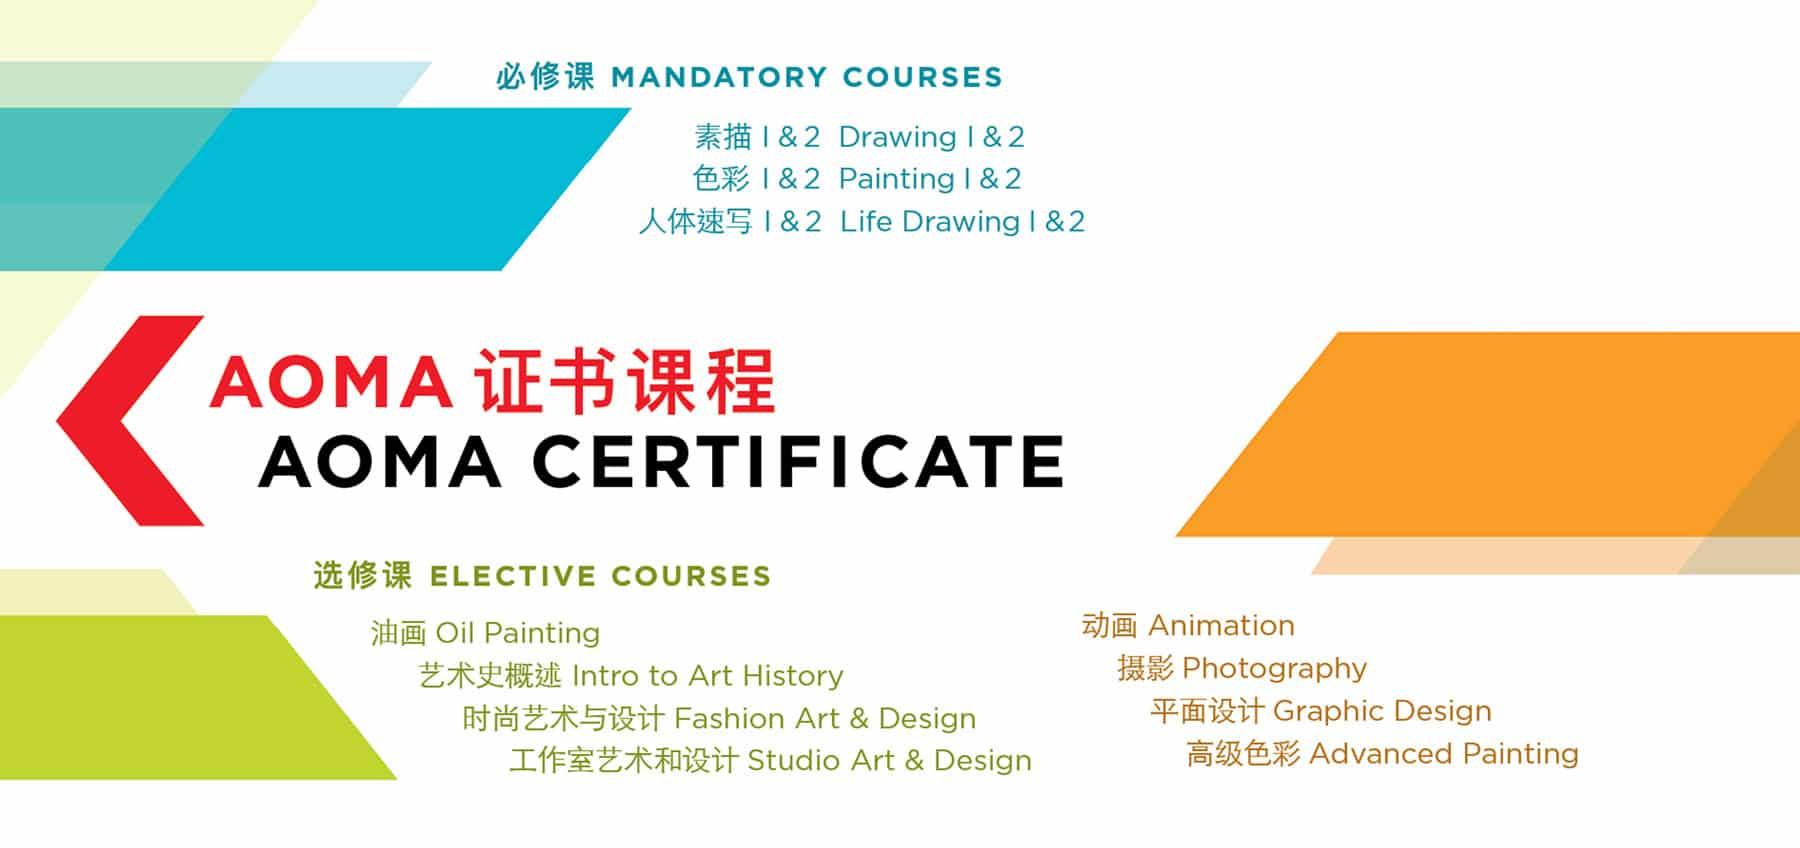 AOMA Certificate